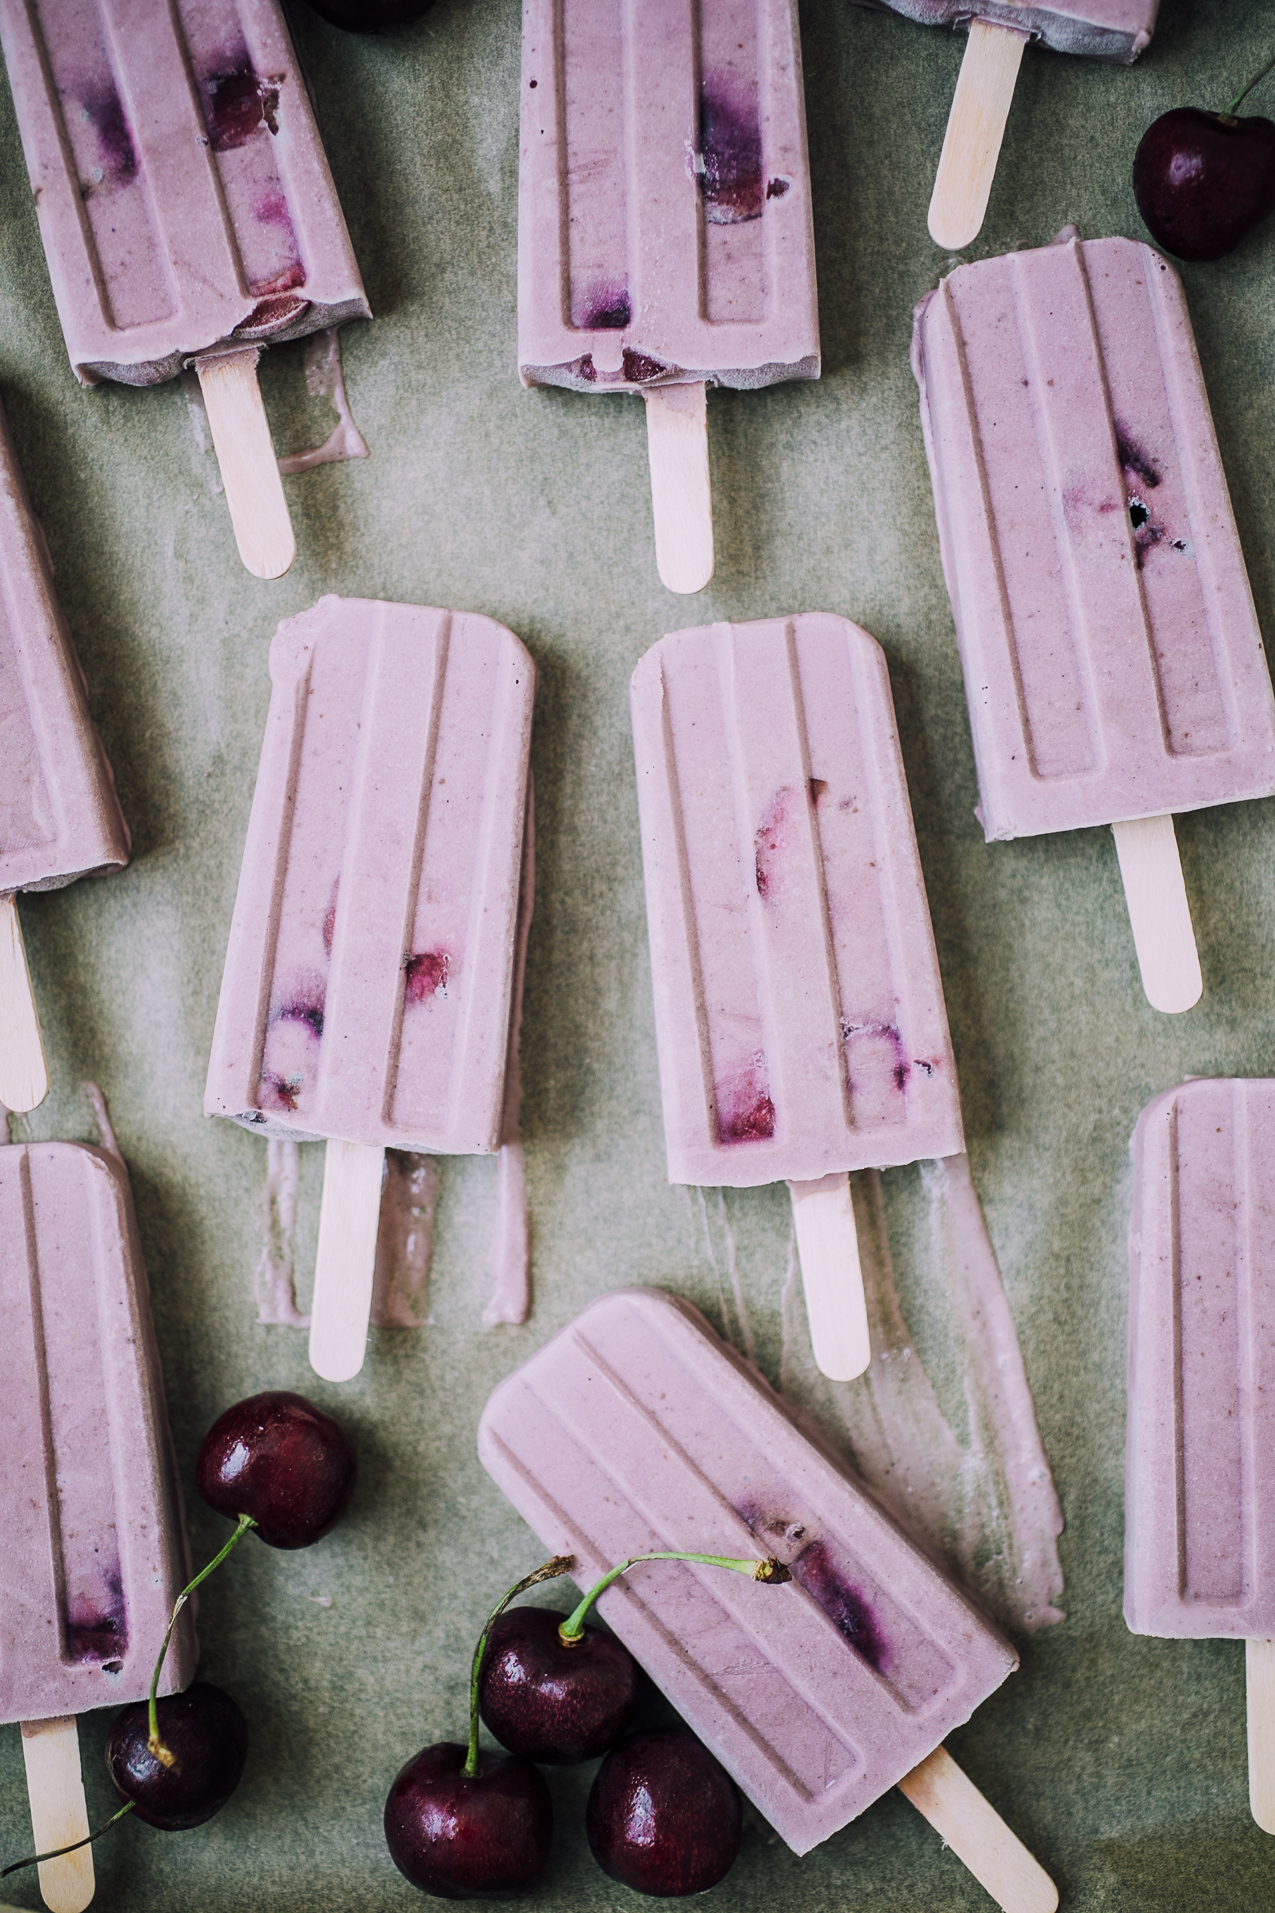 vegan-cherry-almond-popsicles-9201.jpg